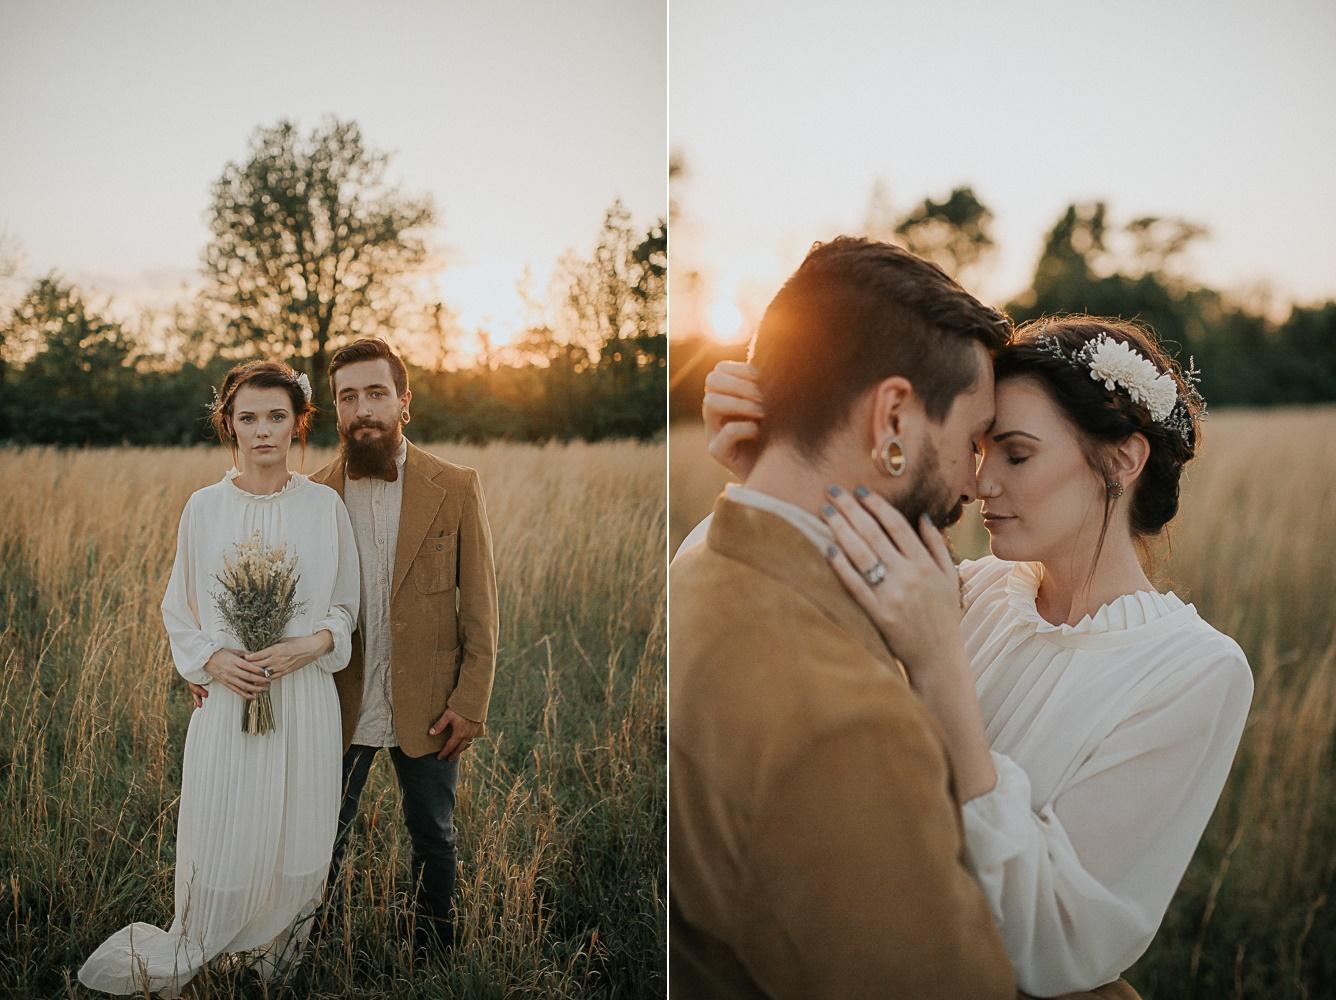 Cassie Cook Photography-Memphis TN-portrait and wedding photographer -7384-horz.jpg